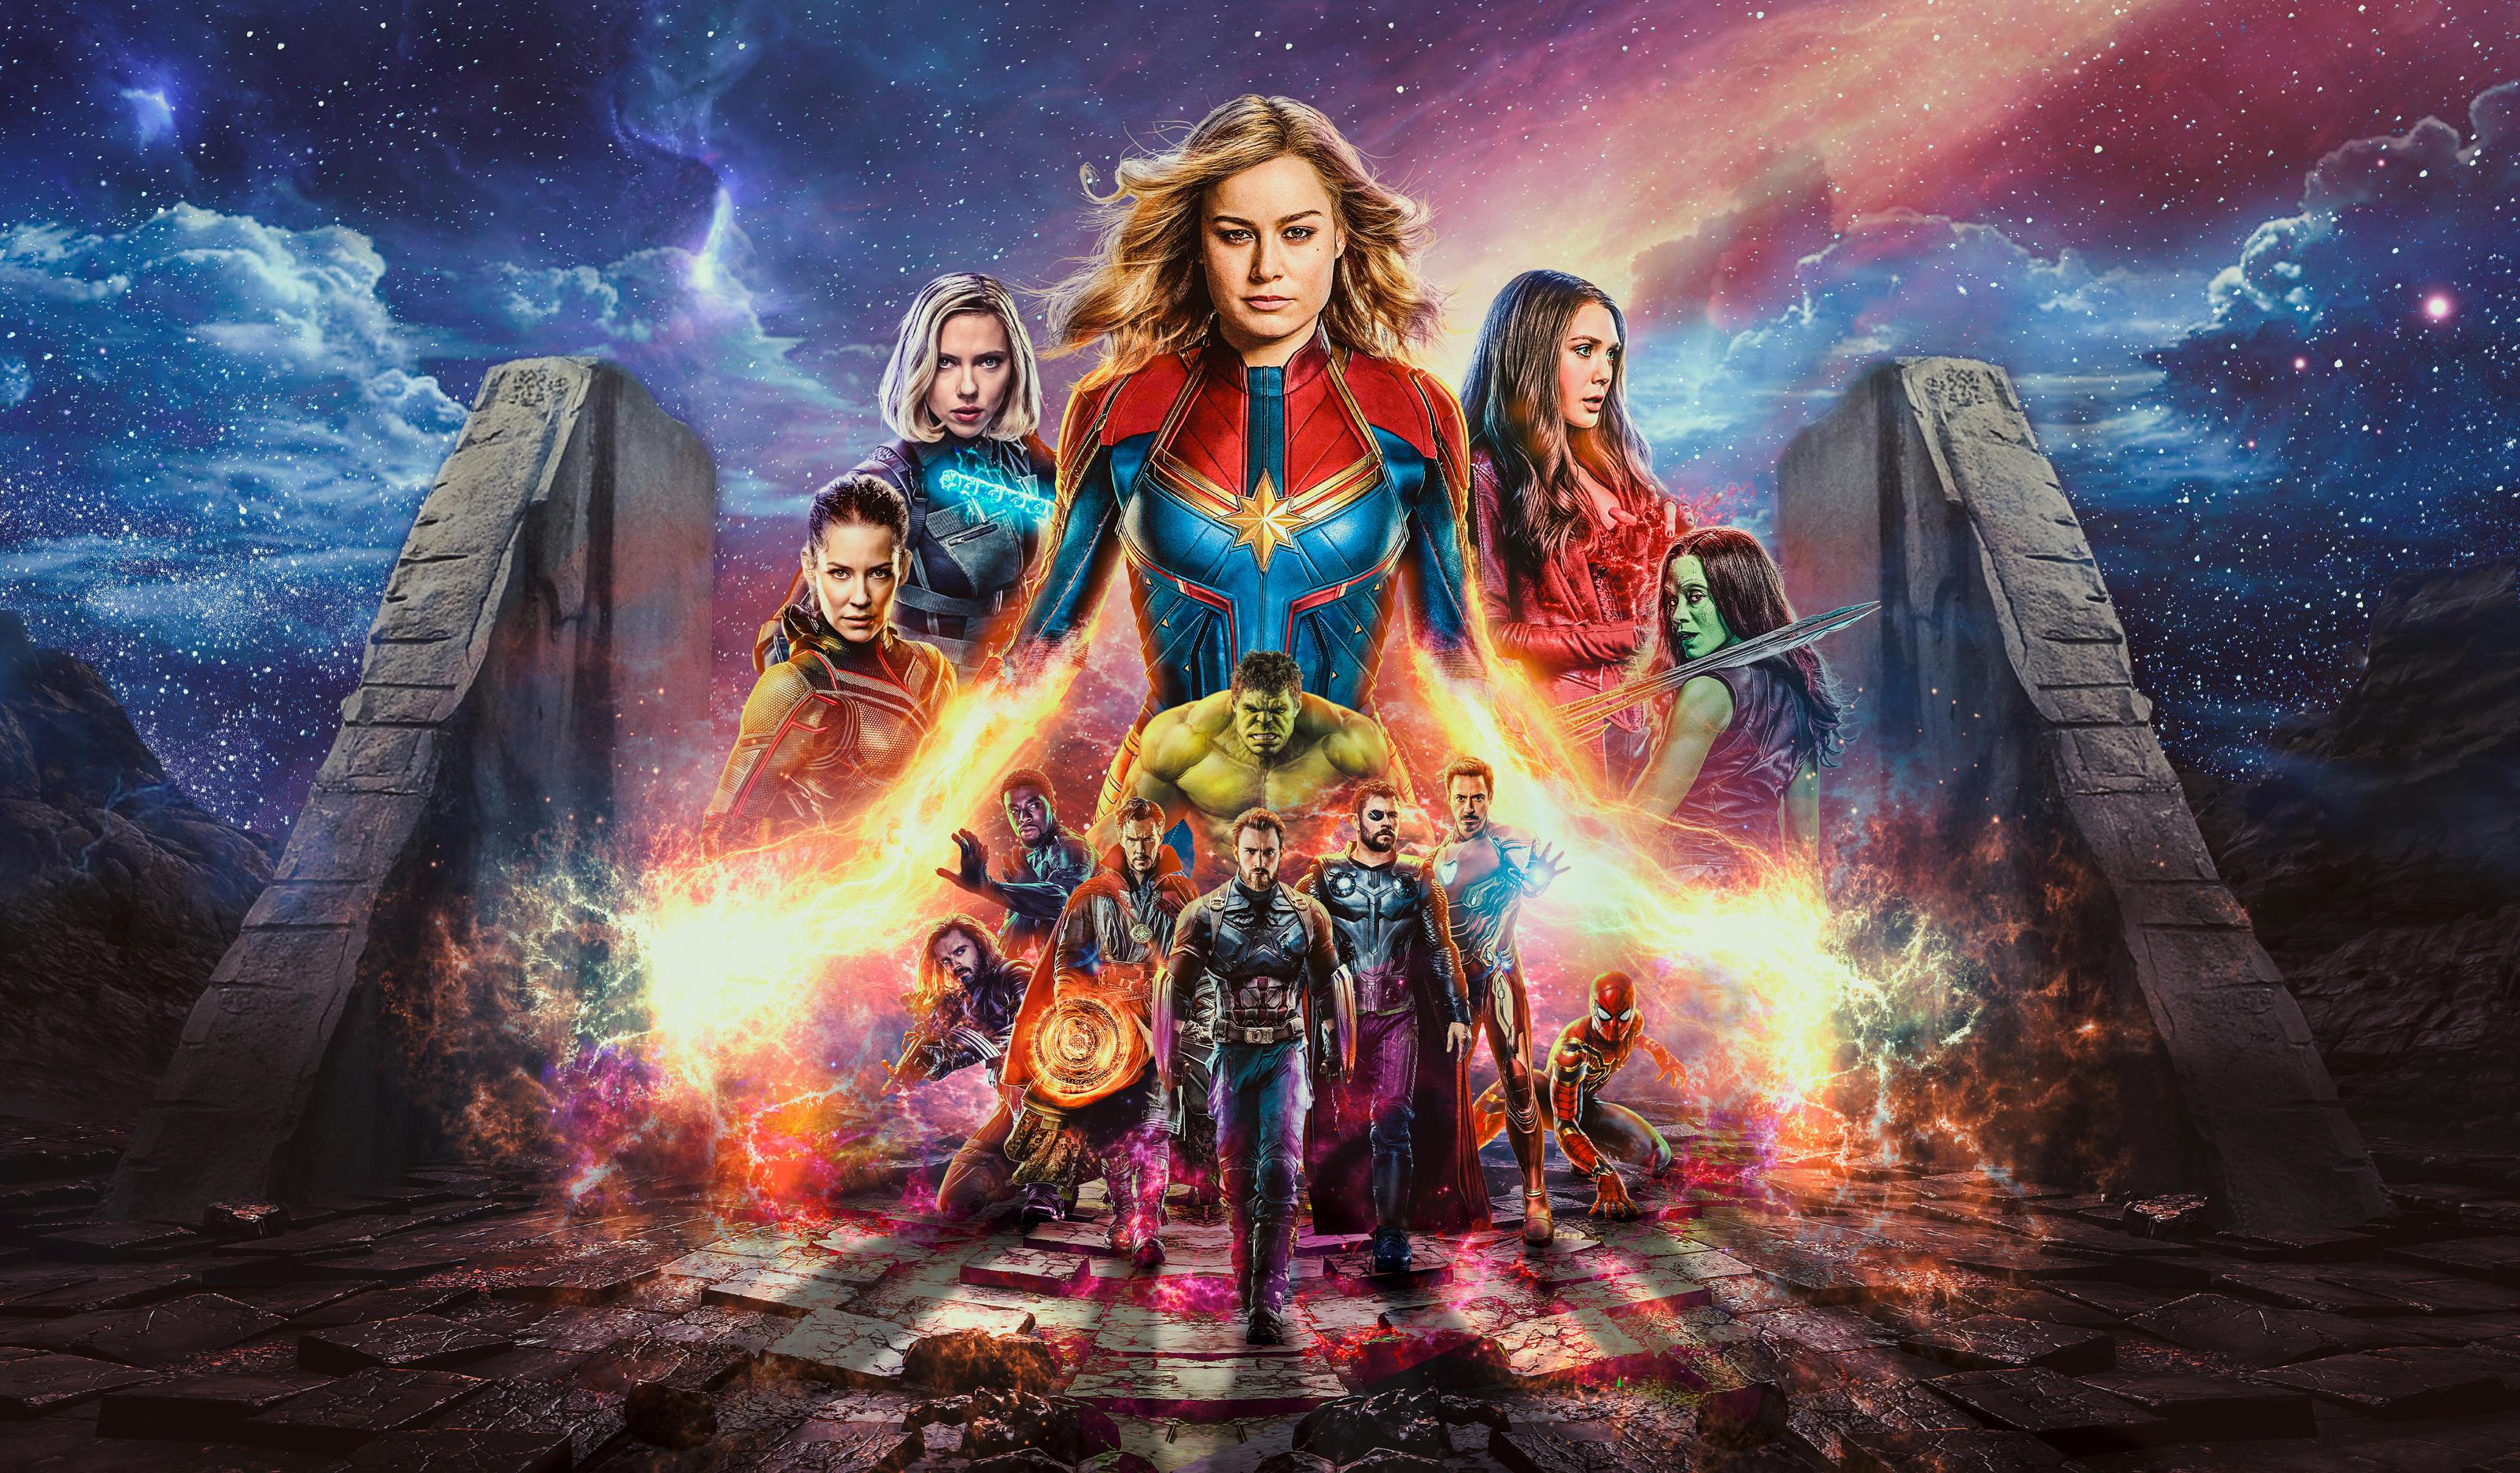 Avengers 4 Endgame 4k Hd Wallpapers Download Mobile Pc 2019